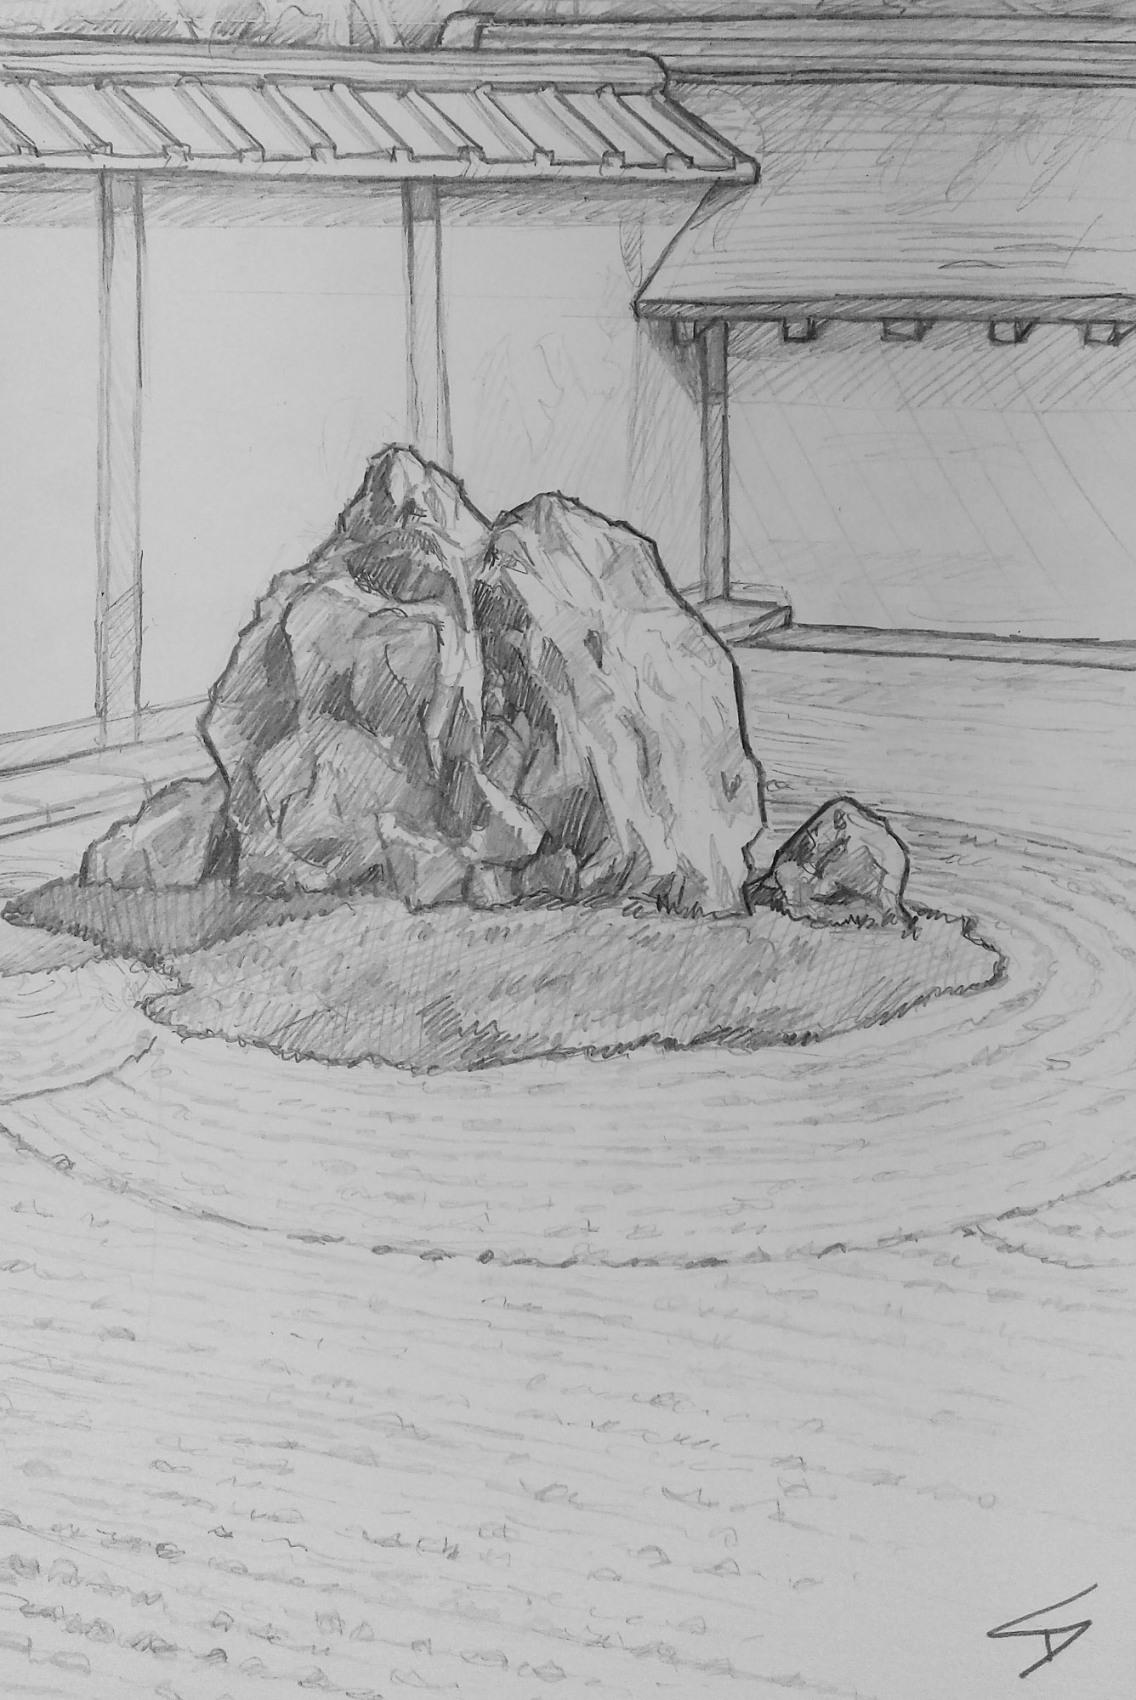 Urban art – Ukyo Ward, Kyoto, Japan. 'Ryoanji Temple.' Artwork from my latest travel art blog article 'Sakura Japan.' Now online - sketchbookexplorer.com @davidasutton @sketchbookexplorer Facebook.com/davidanthonysutton #sketch #drawing #art #japan #kyoto #ryoanjitemple #buddhism #meditation #japanesegardens #gardens #travel #travelblog #cherryblossom #cherryblossomseason #cherryblossomjapan